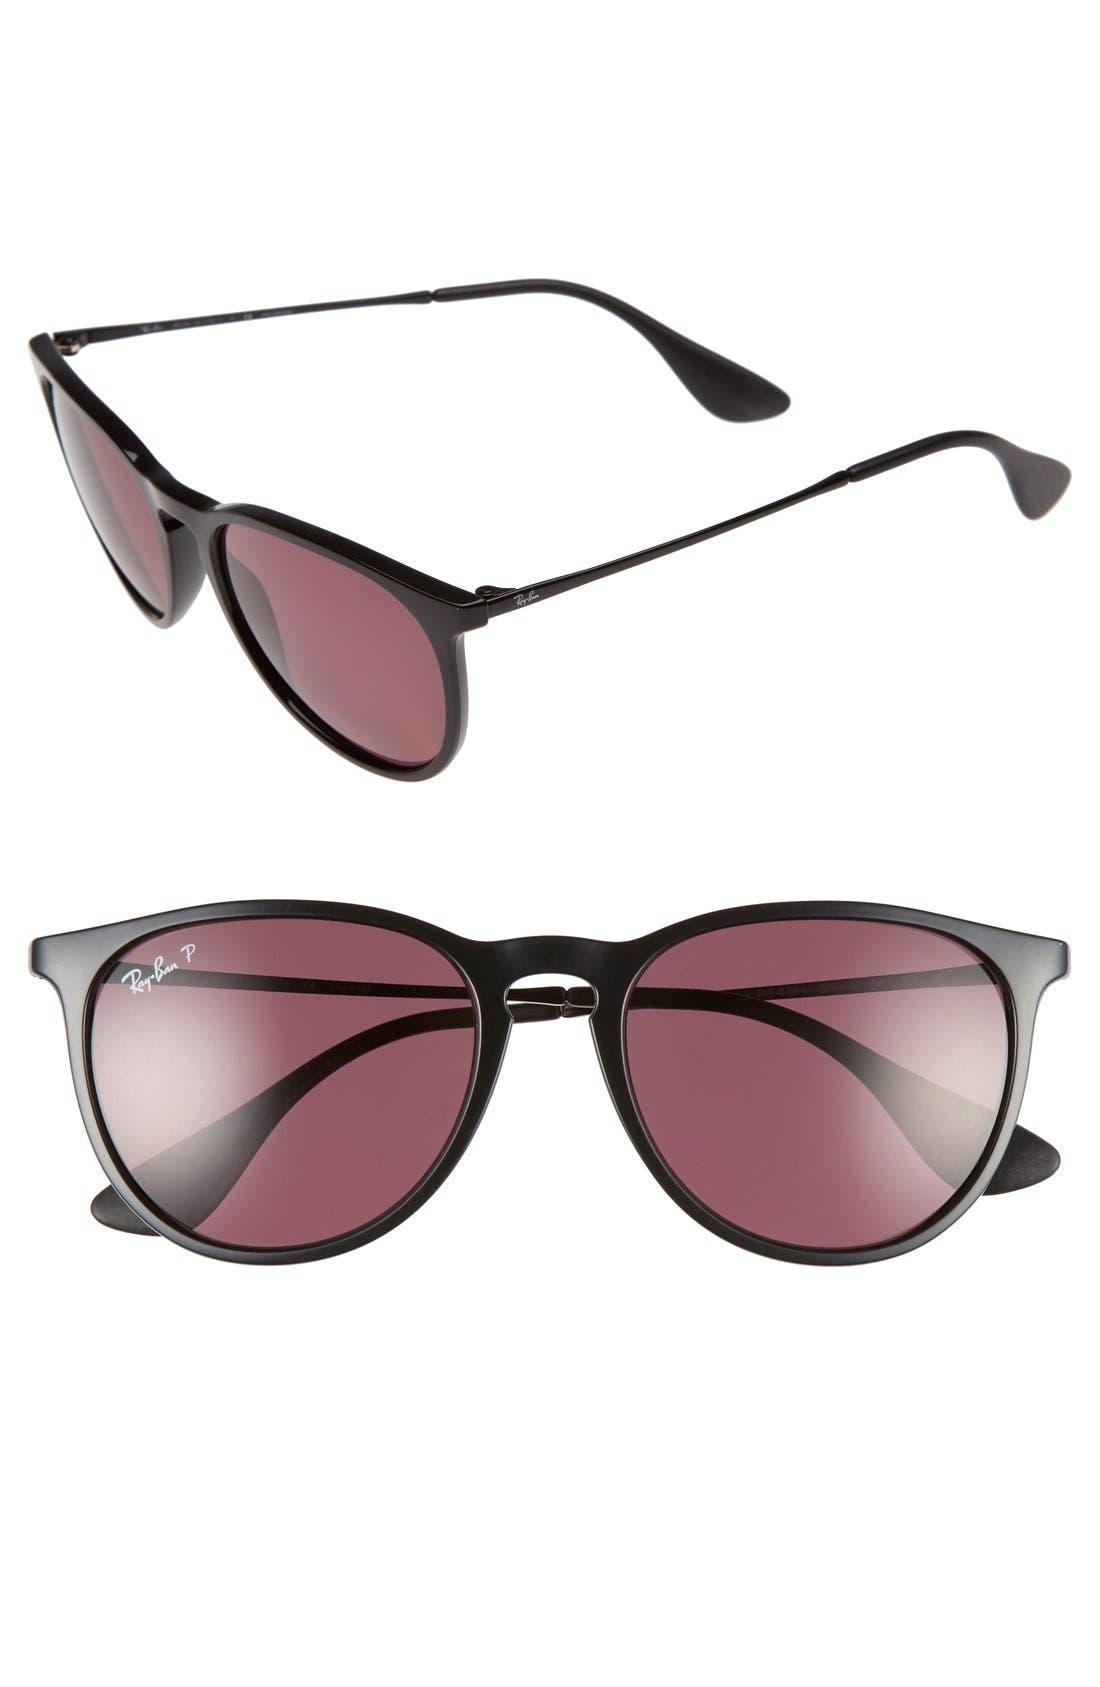 Ray-Ban Erika Classic 5m Sunglasses - Black/ Purple